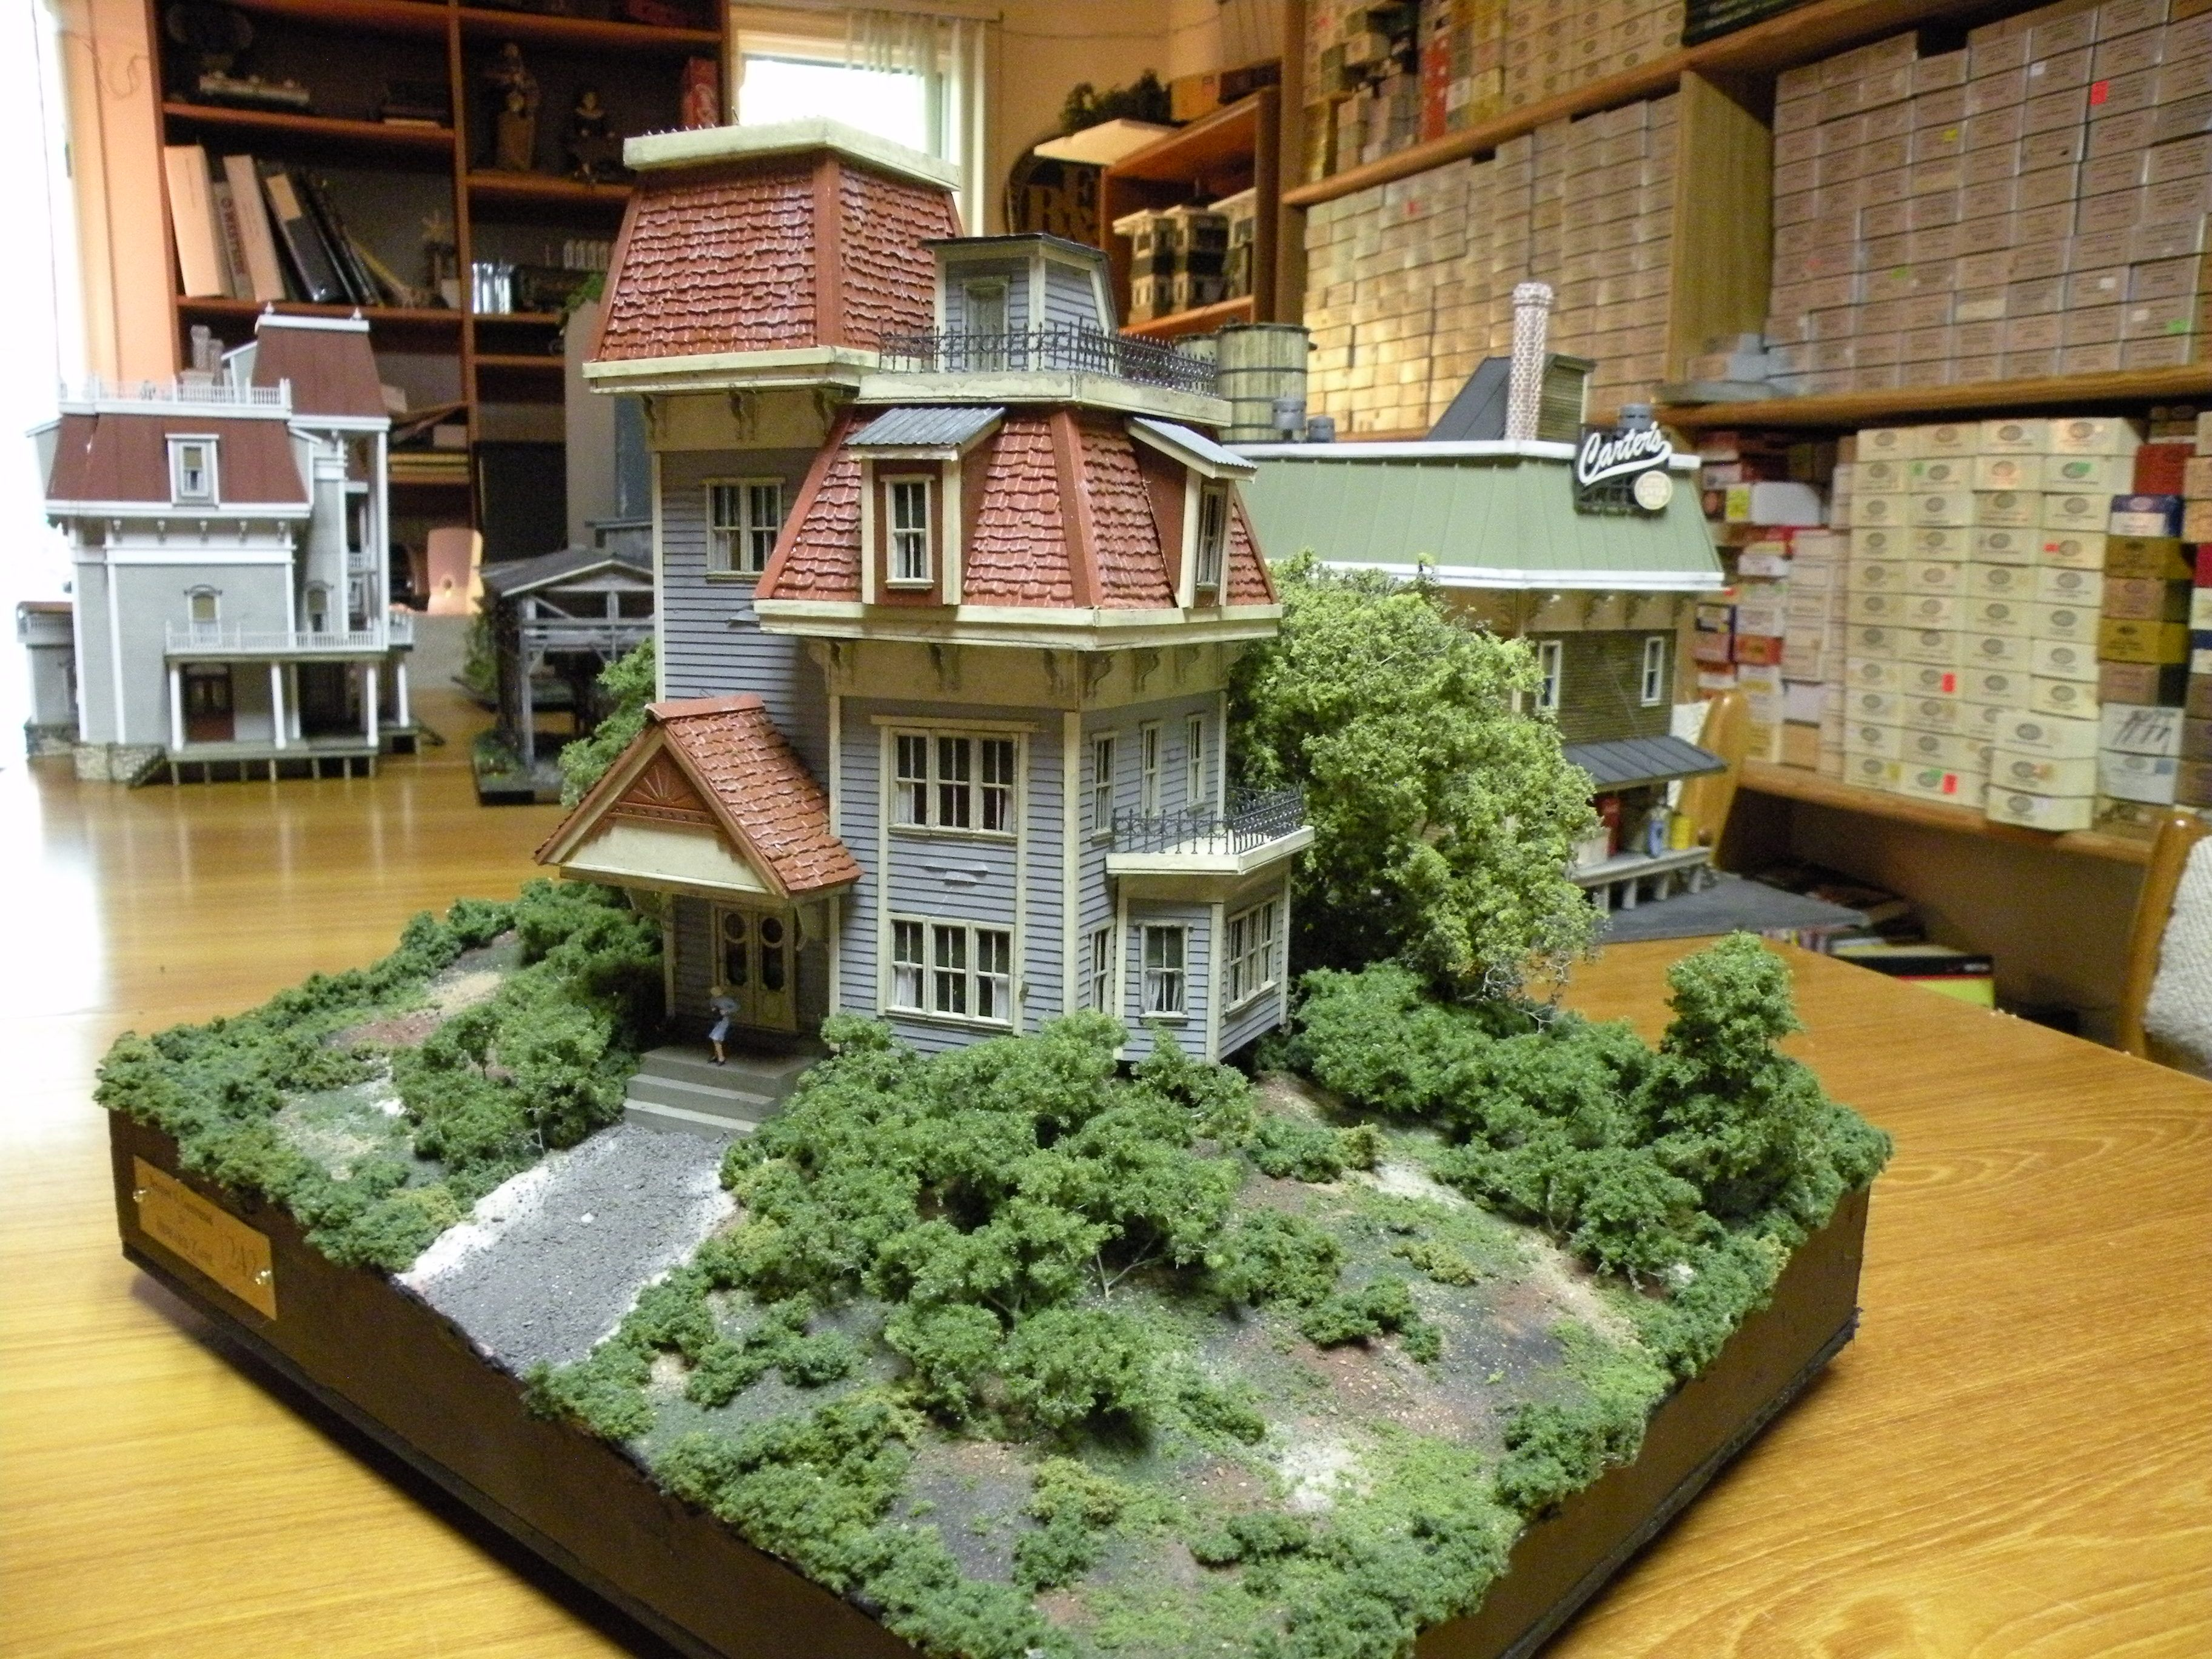 zane structures semi victorian house diorama item 534 1. Black Bedroom Furniture Sets. Home Design Ideas